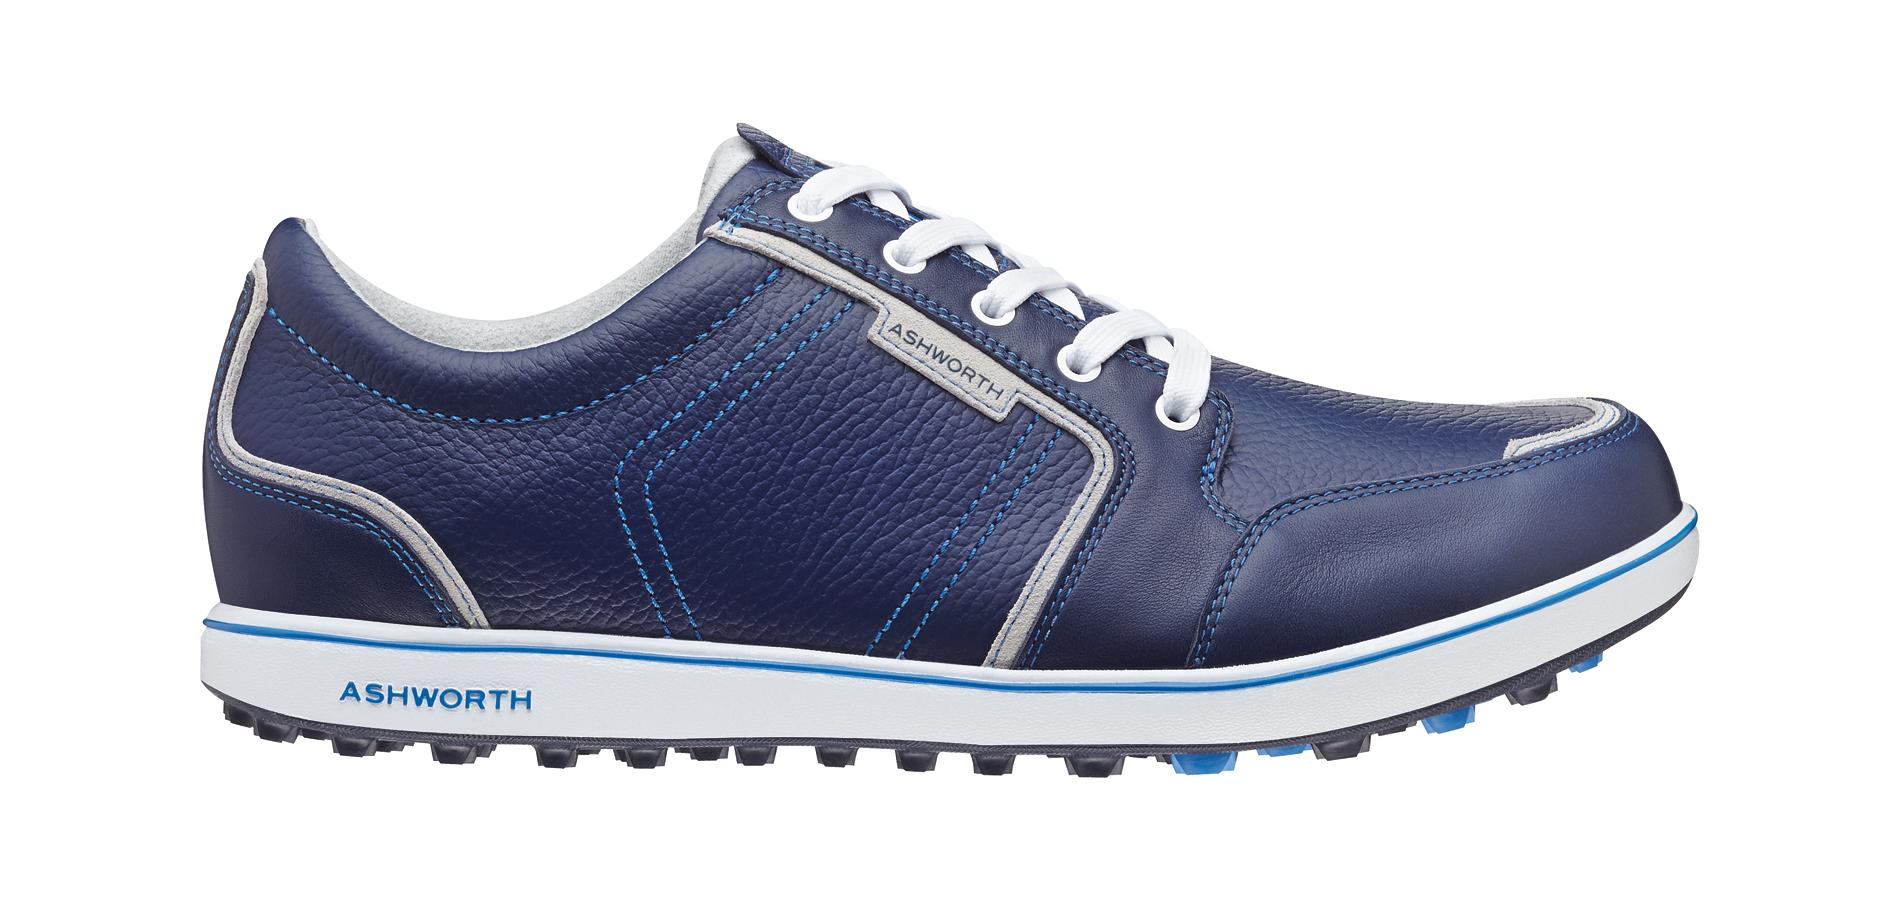 ashworth cardiff adc spikeless golf